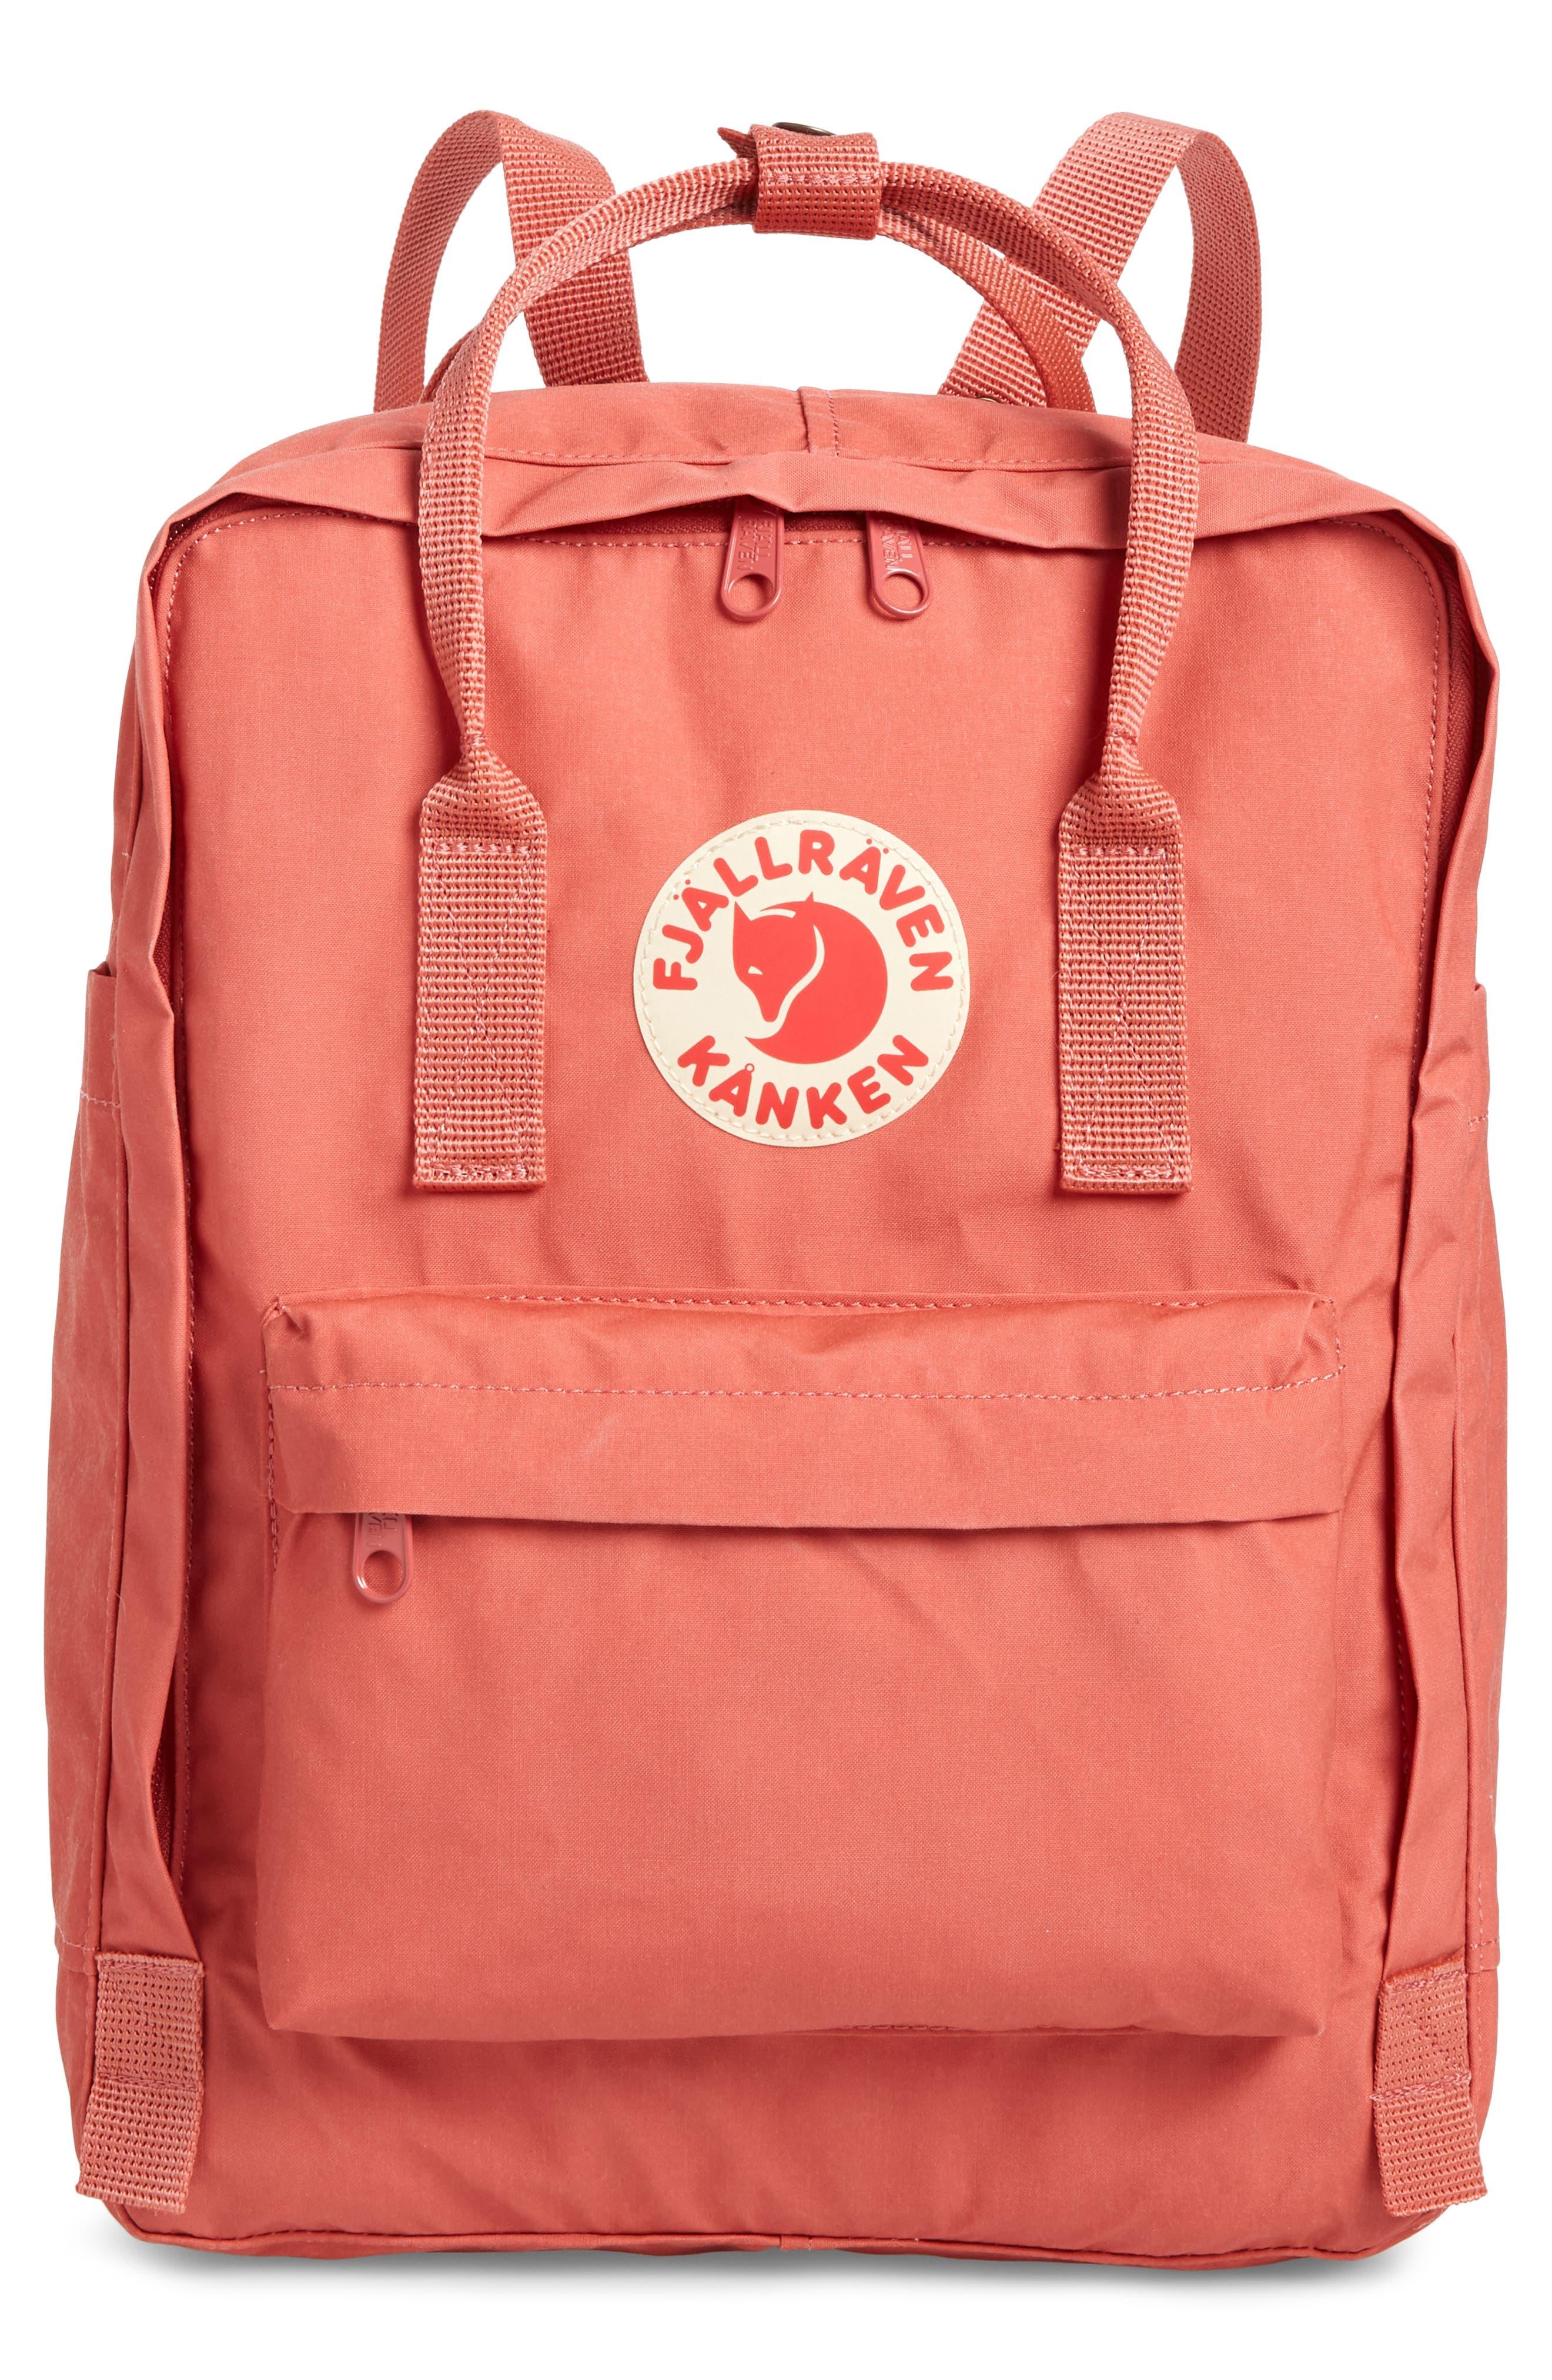 Kånken Water Resistant Backpack, Main, color, DAHLIA